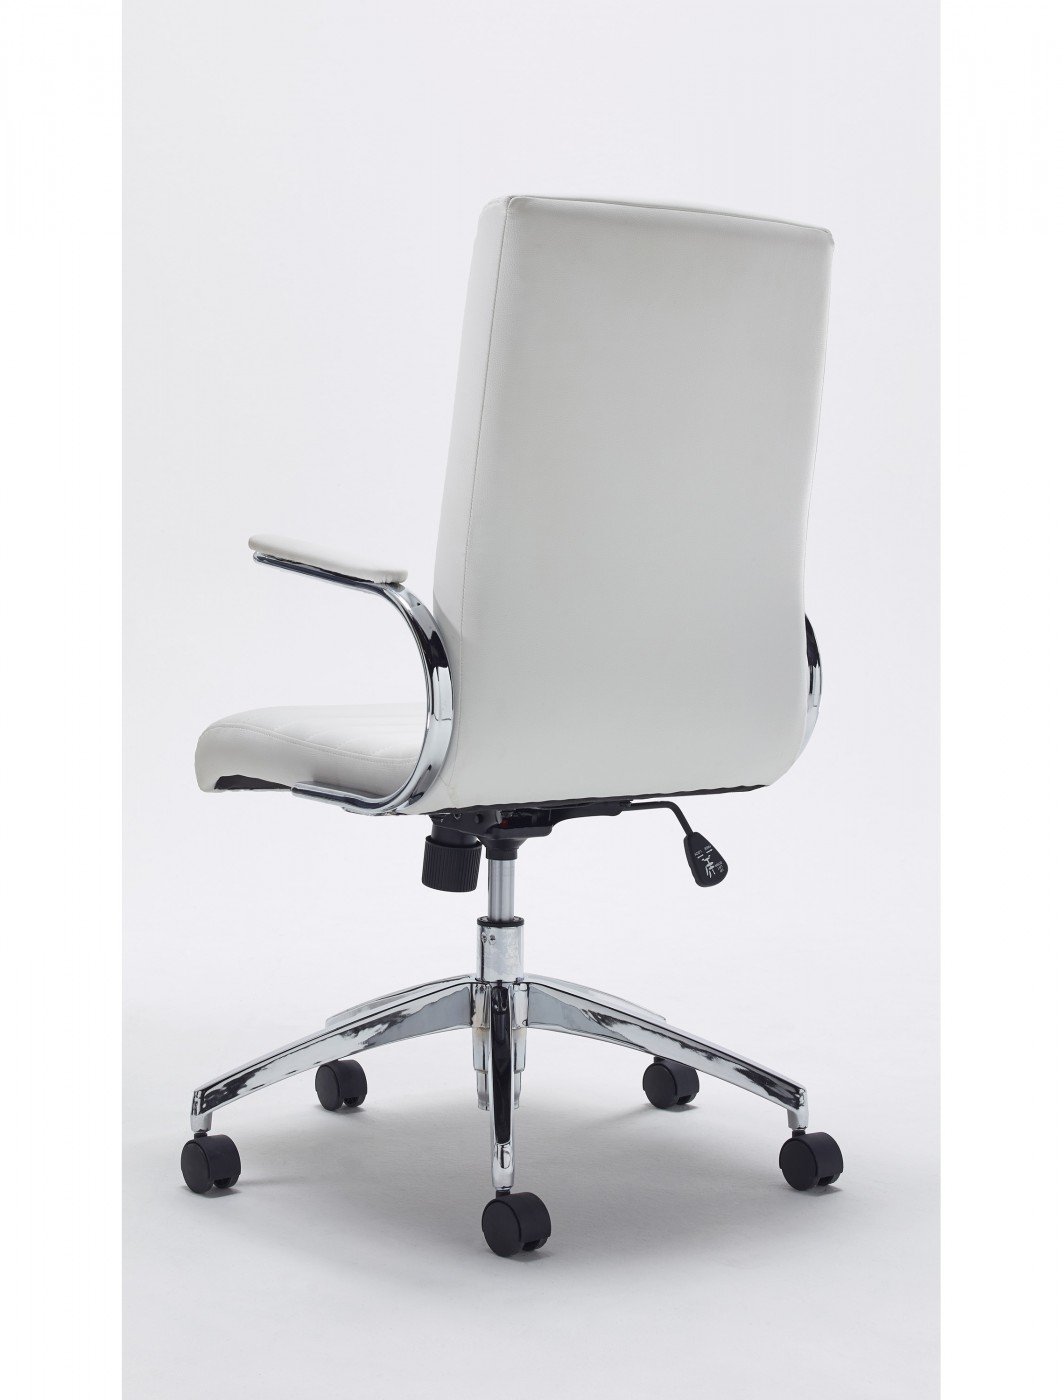 office chair pedestal stool white tc lite 1600mm desk and baresi bundle